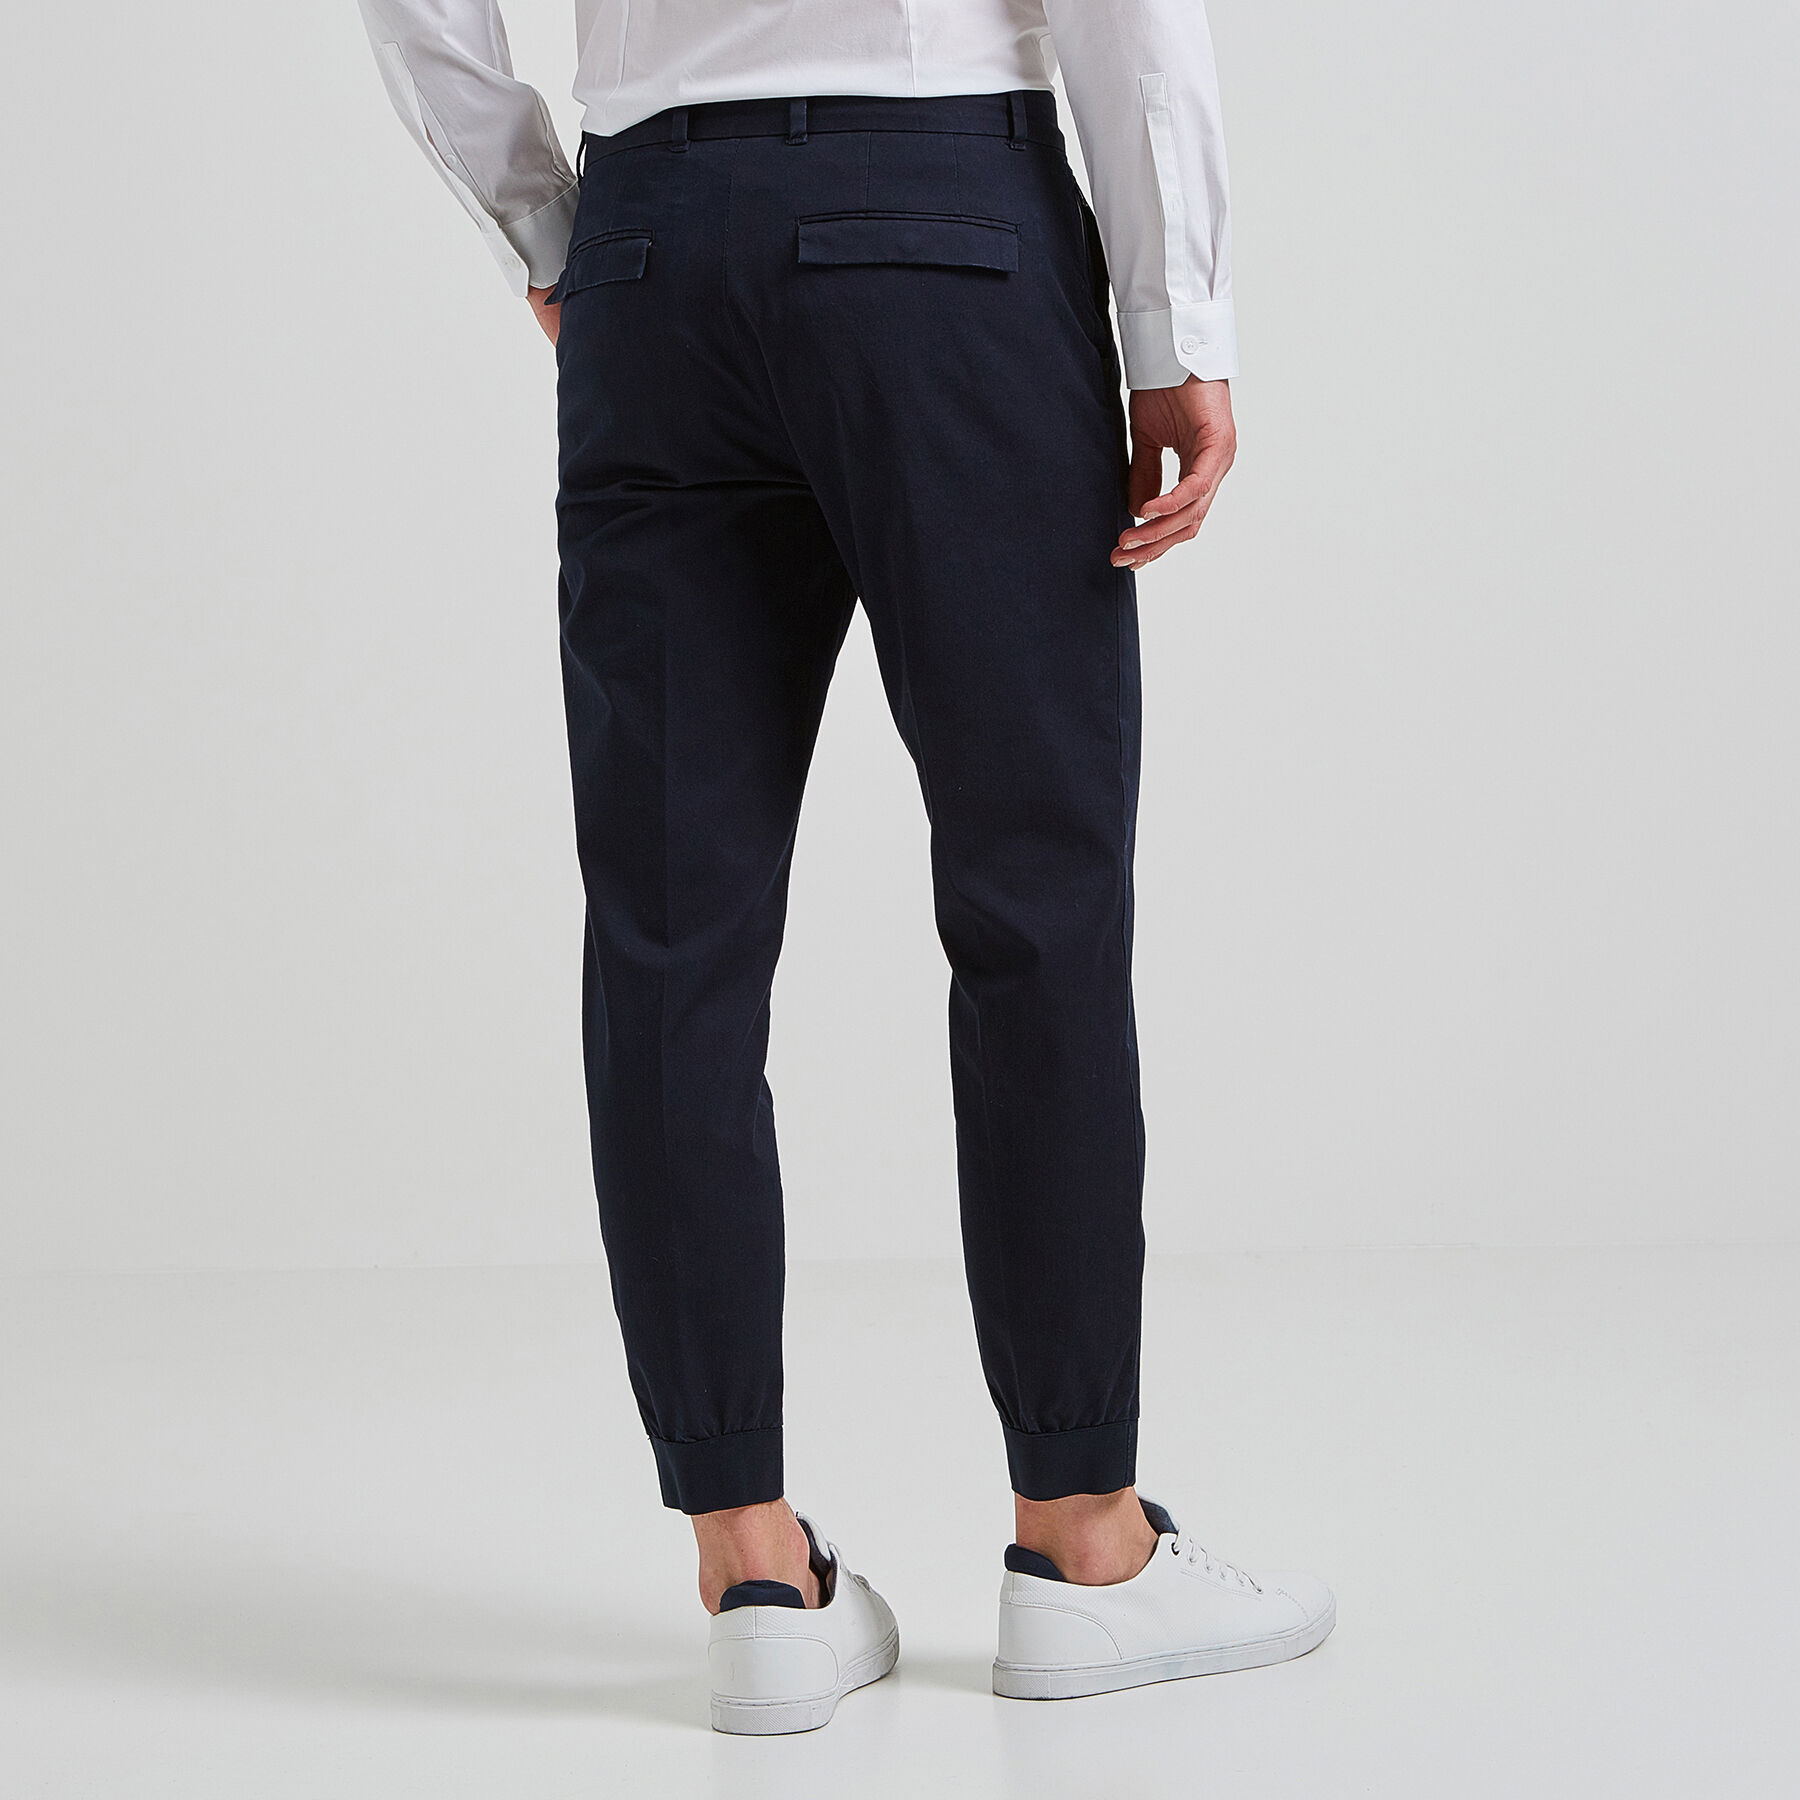 3843309ca8ff6 Pantalon jogging Bleu Marine Homme - Jules